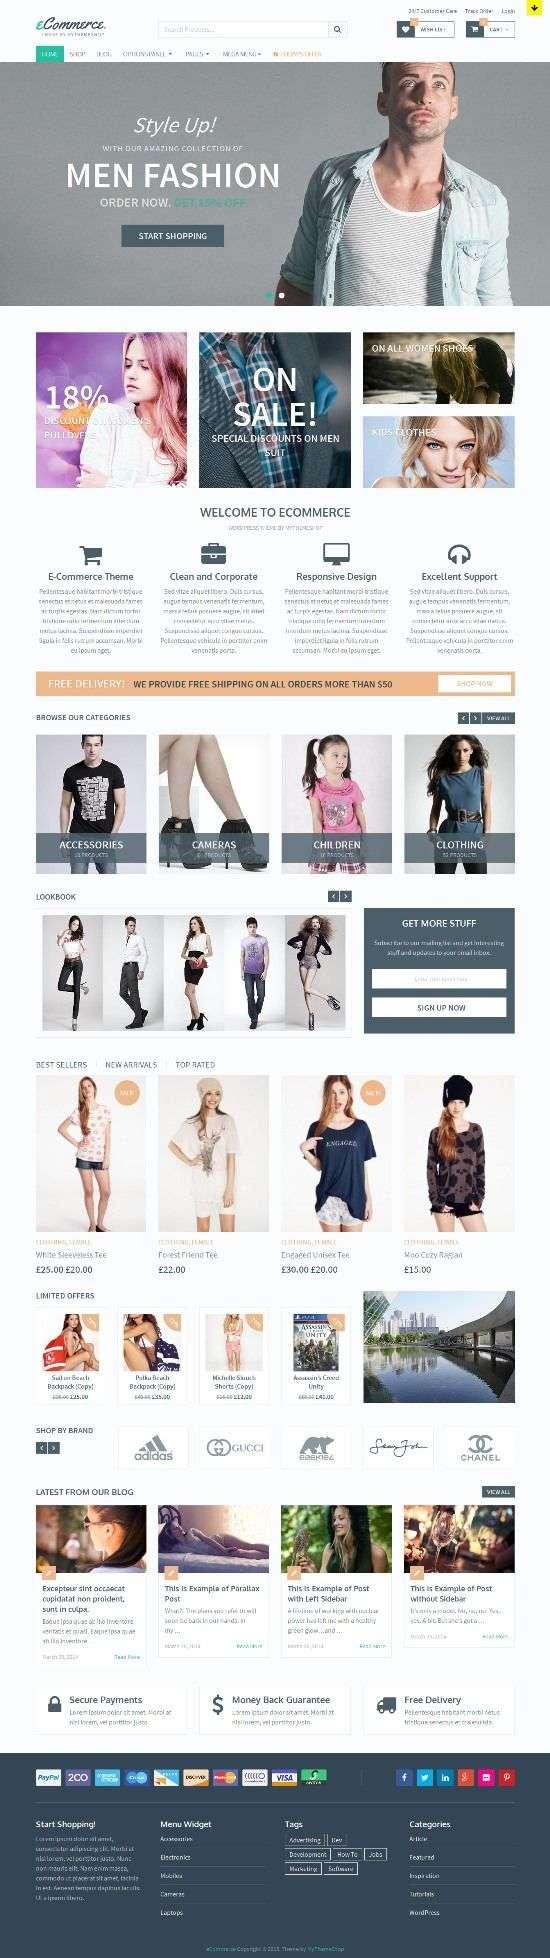 ecommerce-mythemeshop-wordpress-theme-01